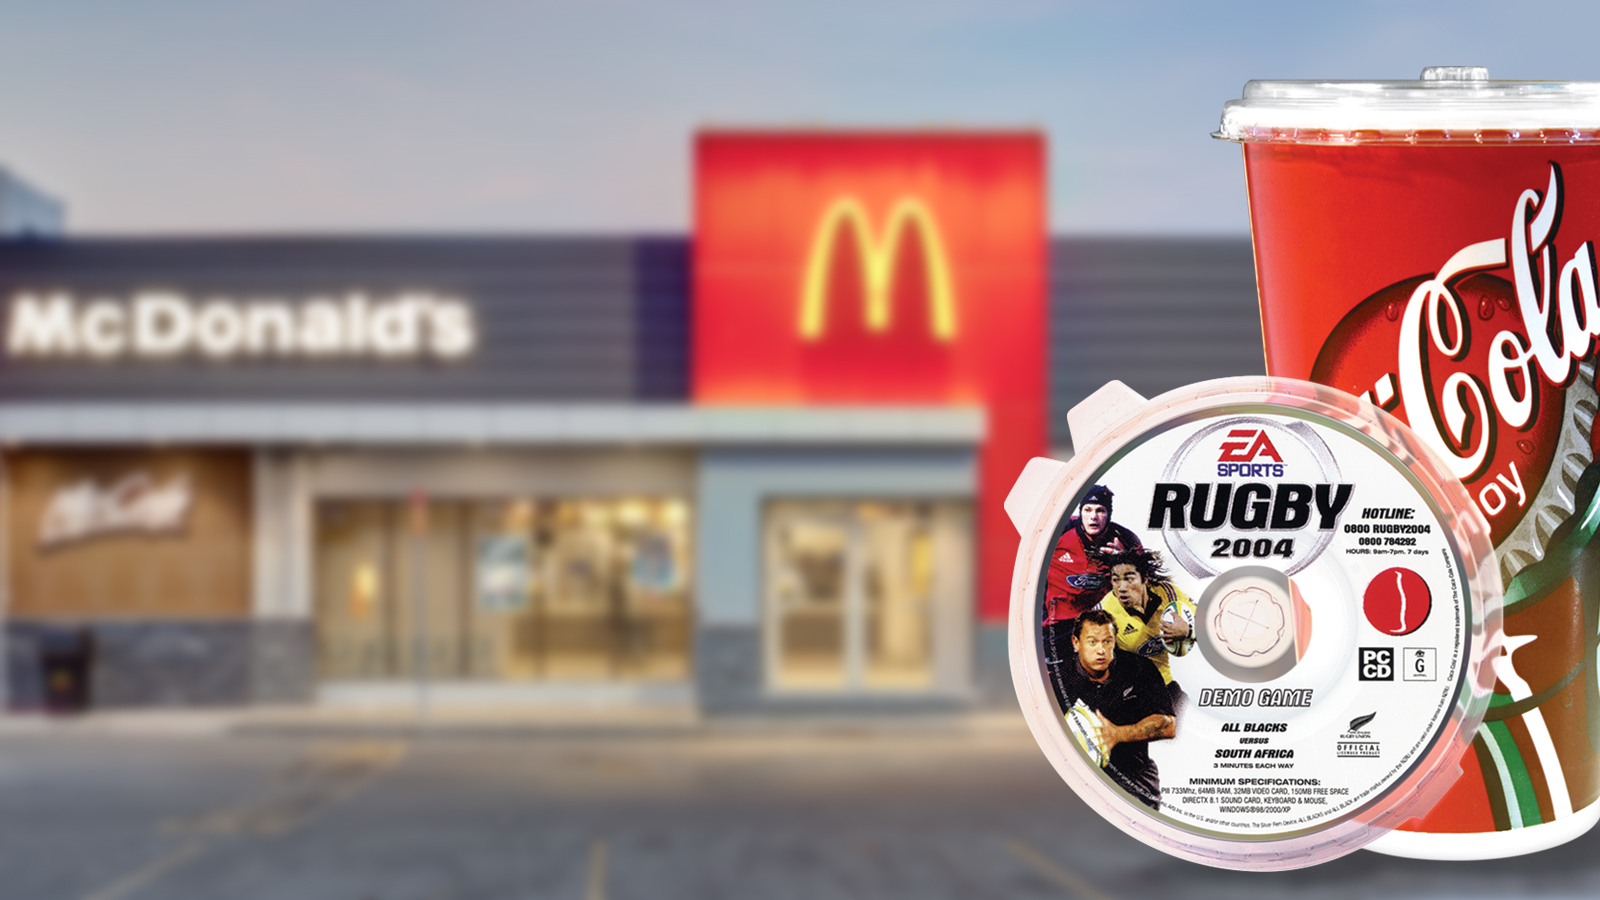 Client: McDonald's